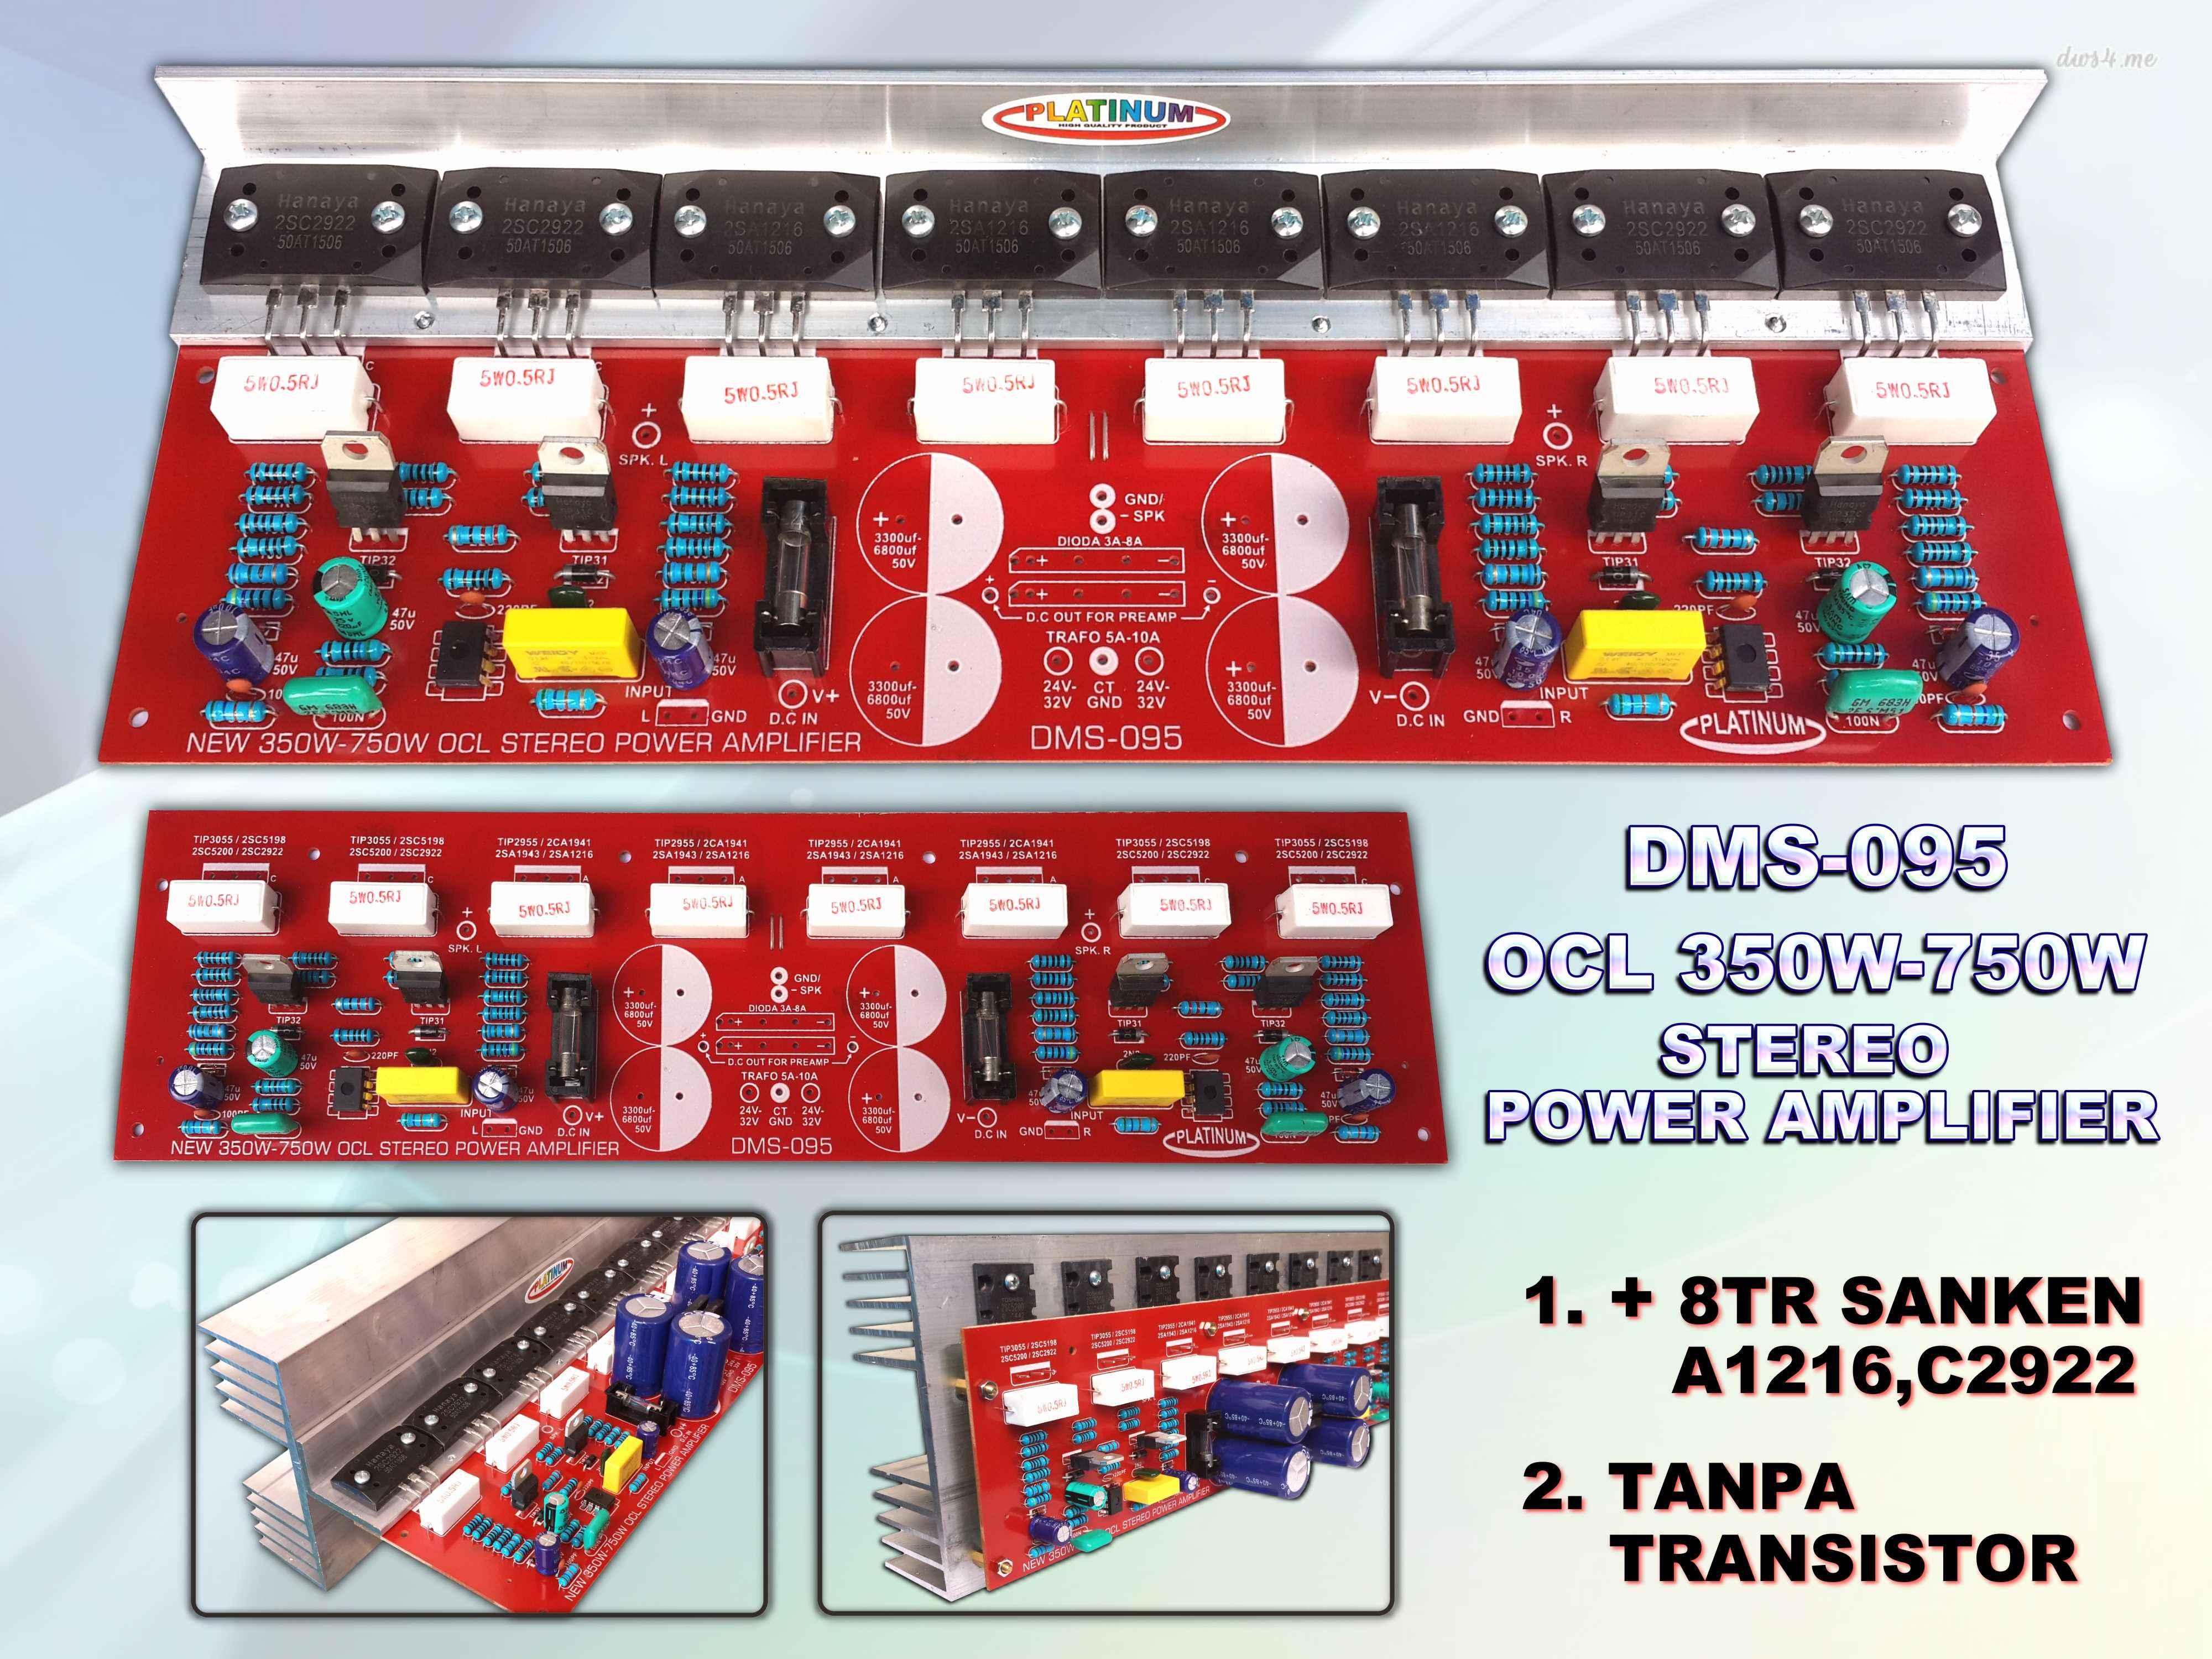 Https 2018 07 20 Restorasi Radio Tabung Philips Bin Indonesias Legendary Diy Power Amplifier 150w Ocl Dms 095